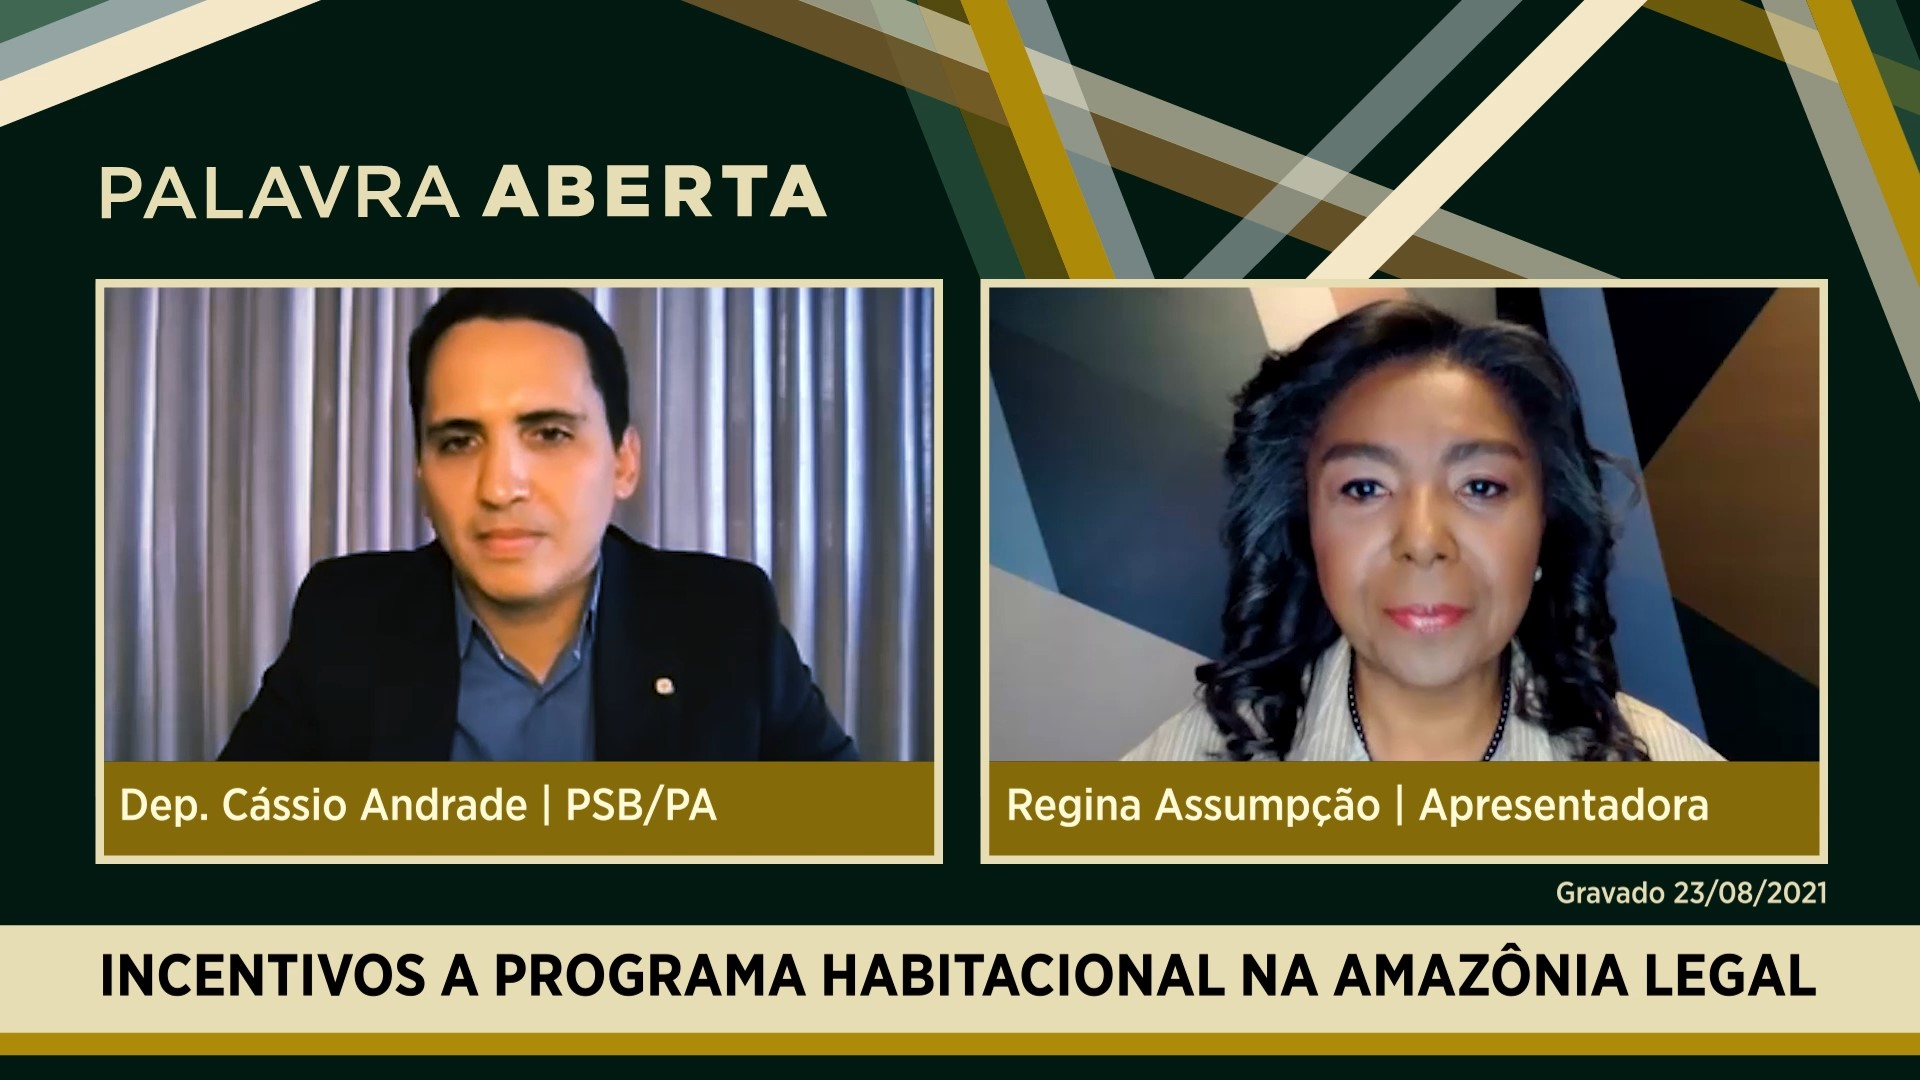 Incentivos para programa habitacional na Amazônia Legal